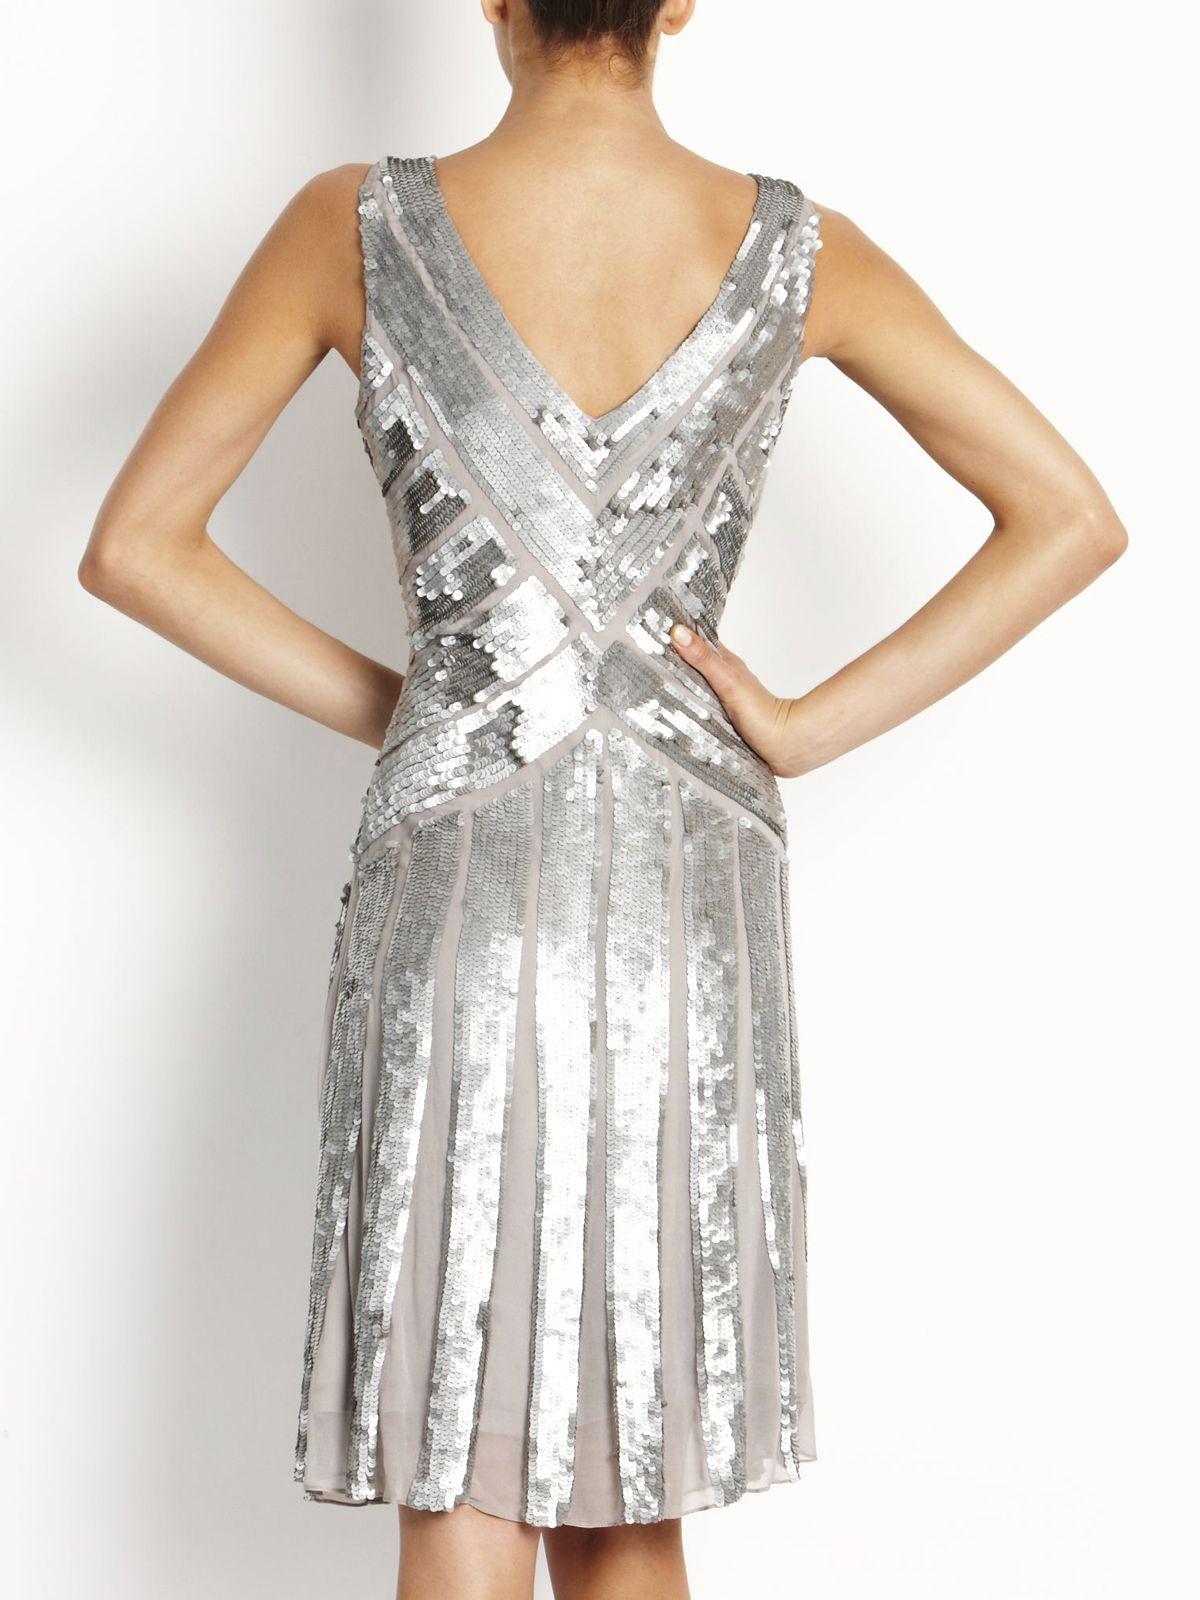 Amazing Art Deco Cocktail Dress Images - Wedding Dress Ideas ...